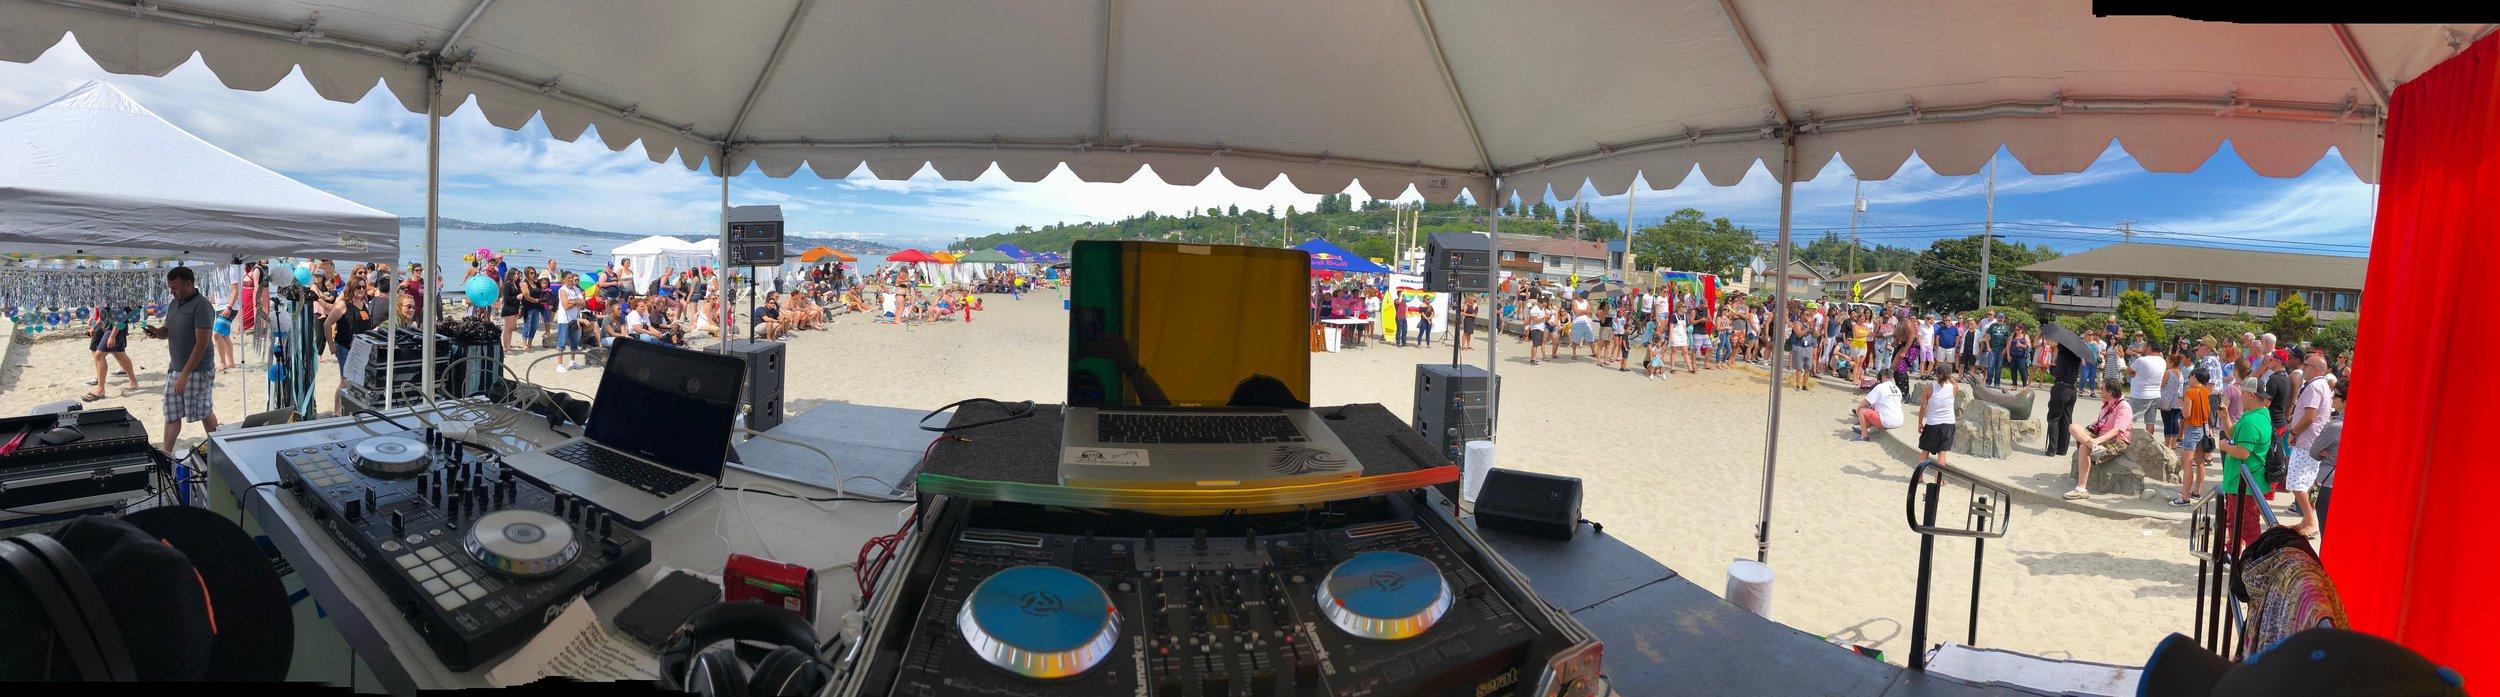 beach turntables IMG_0409.jpg